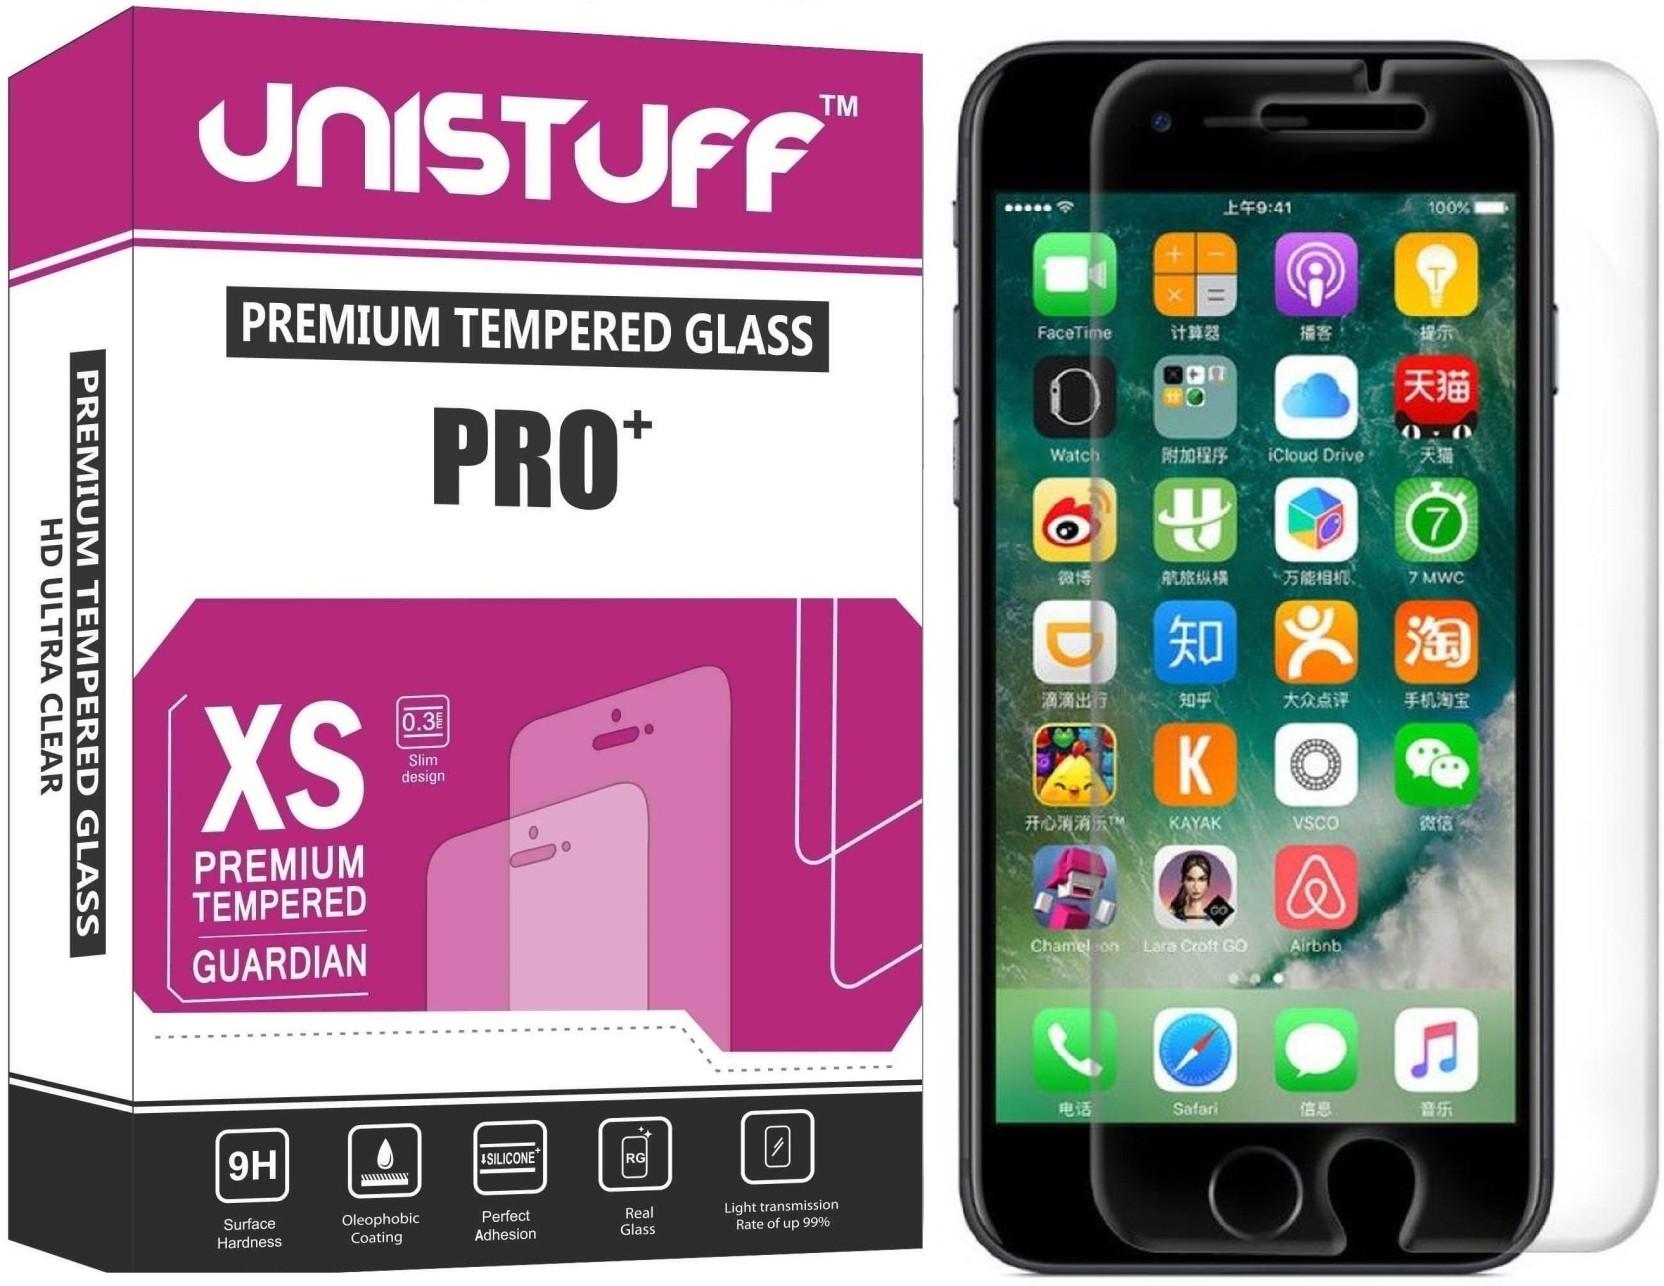 Unistuff Tempered Glass Guard For Apple Iphone 7 Plus 32gb Jet Black Grs International On Offer